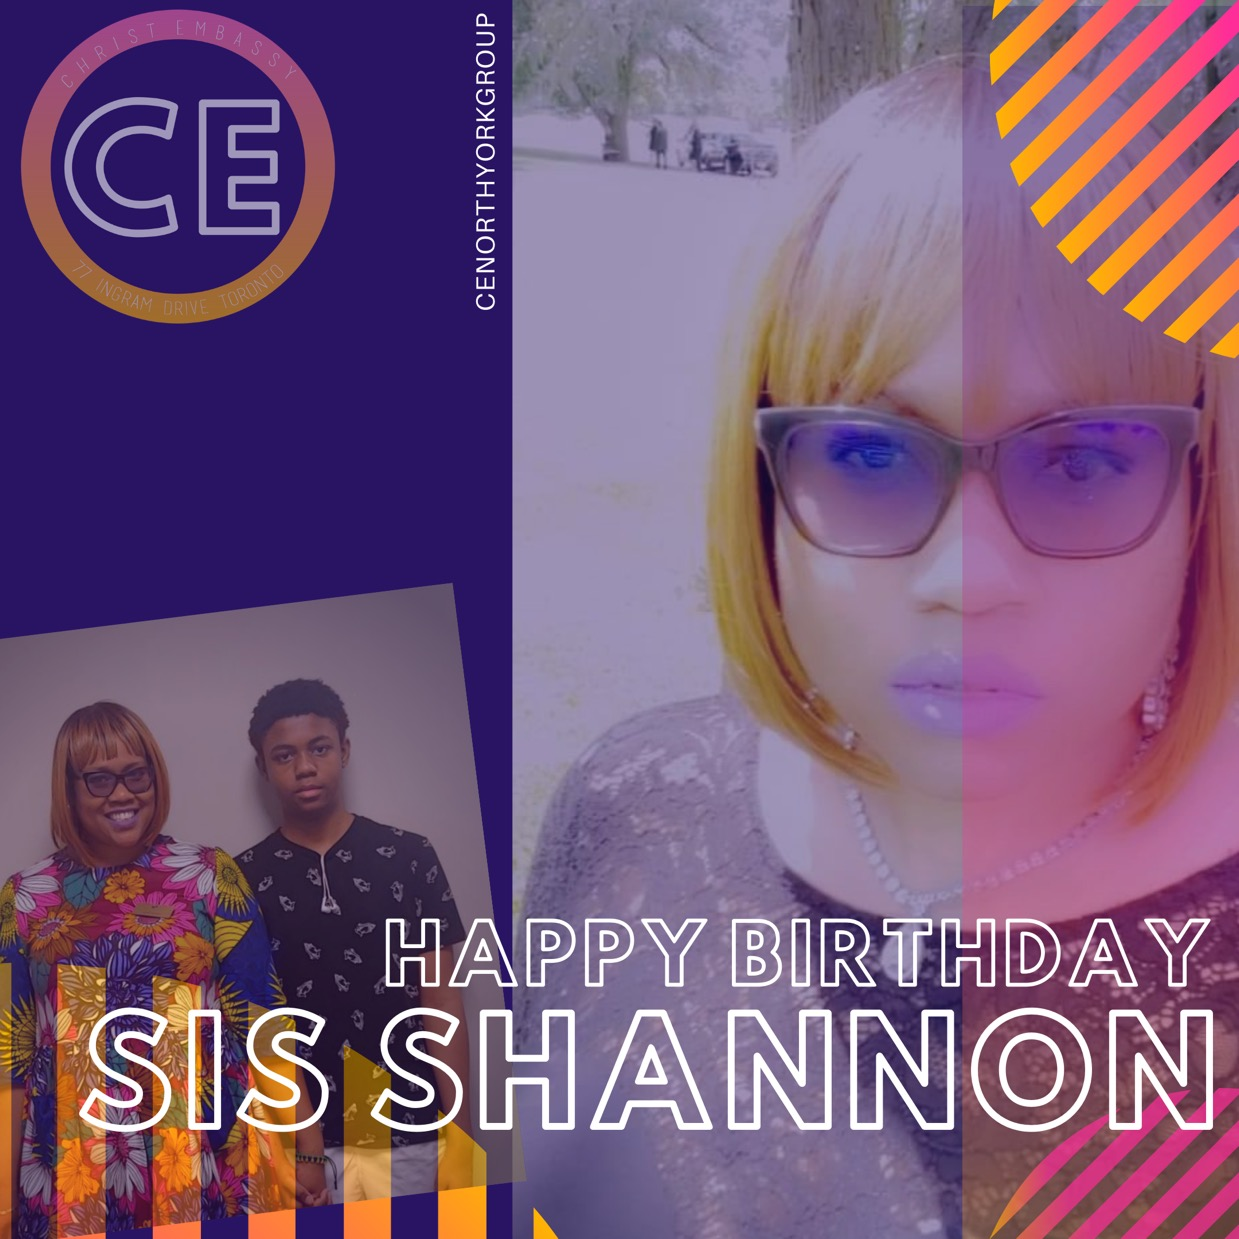 Happy Birthday Dearest Sister Shannon.